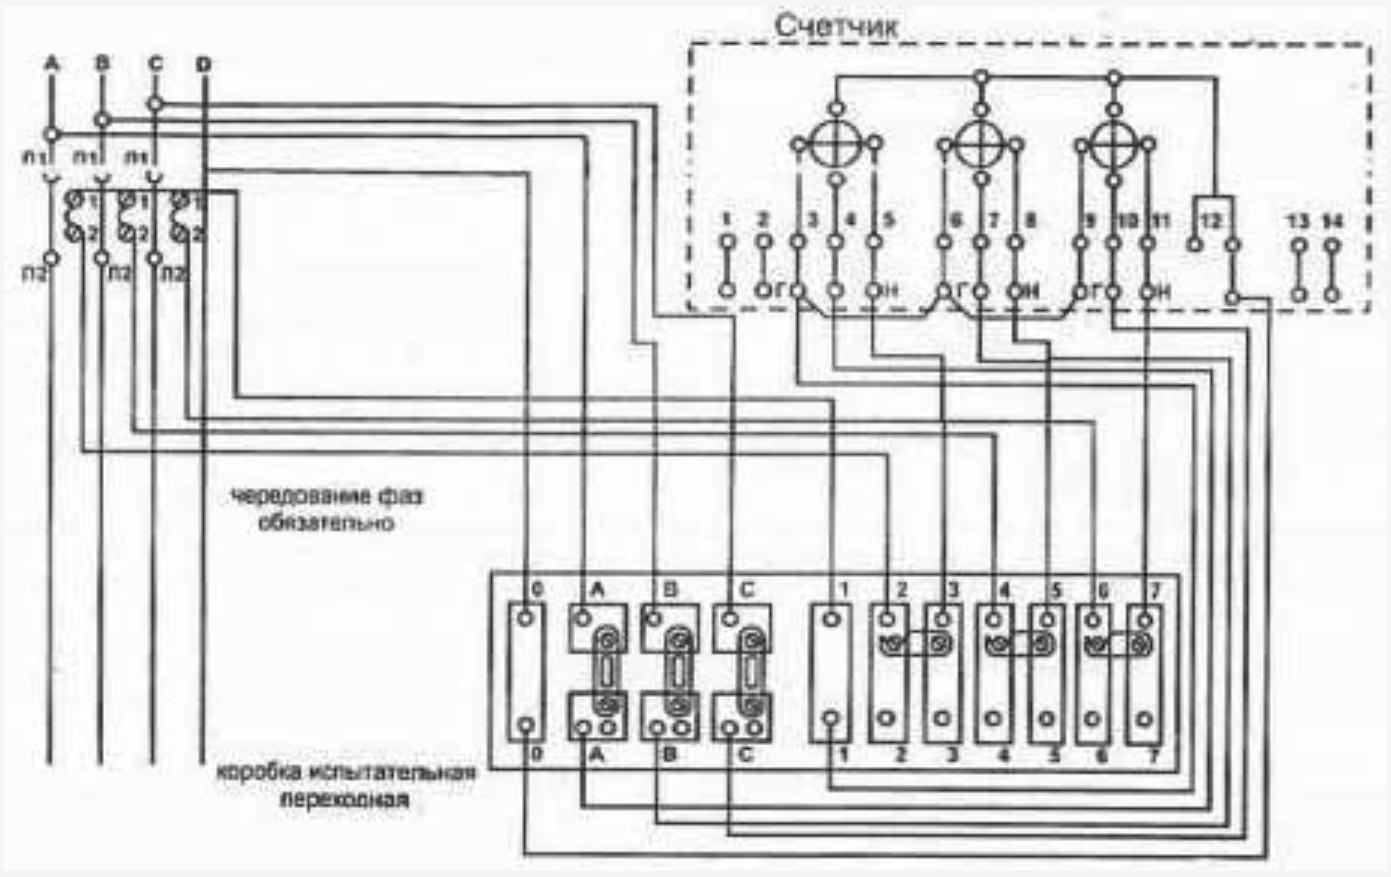 Фото подключения 3х фазного счетчика меркурий через трансформаторы тока 2